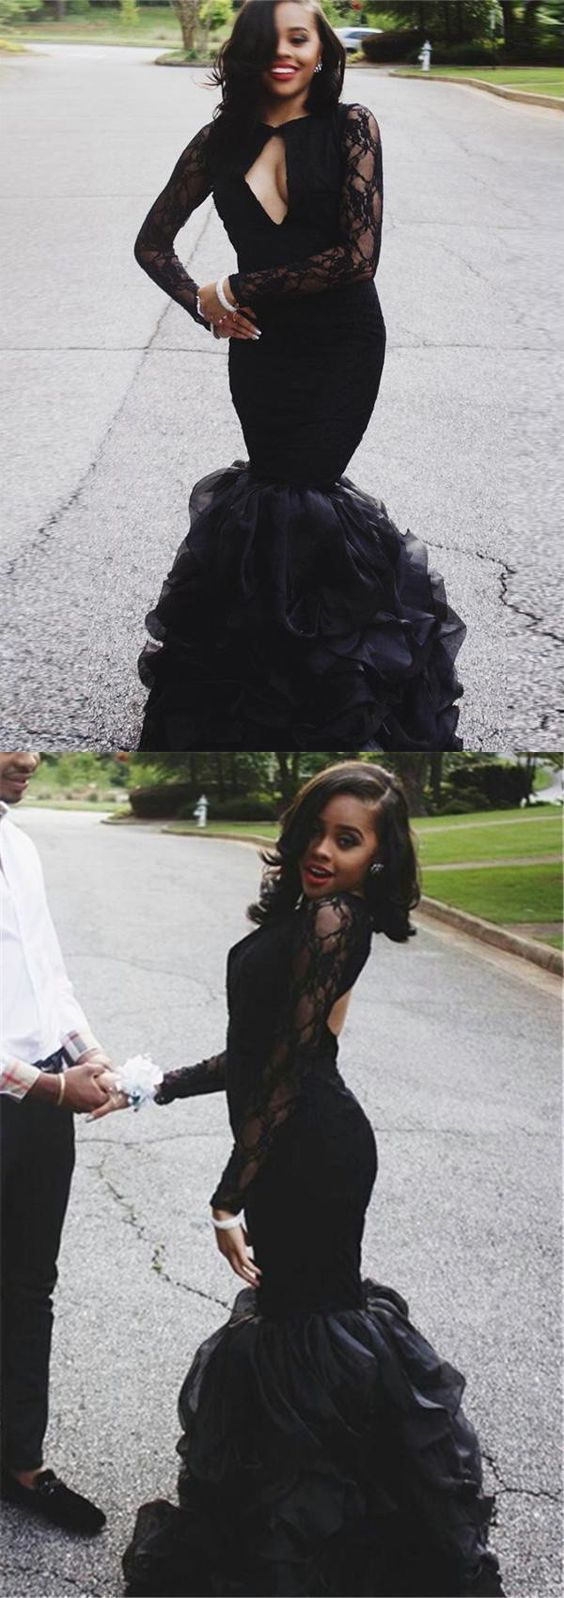 Fabulous Beautiful Black Mermaid Prom Dress Sexy Long Sleeve Prom Dress